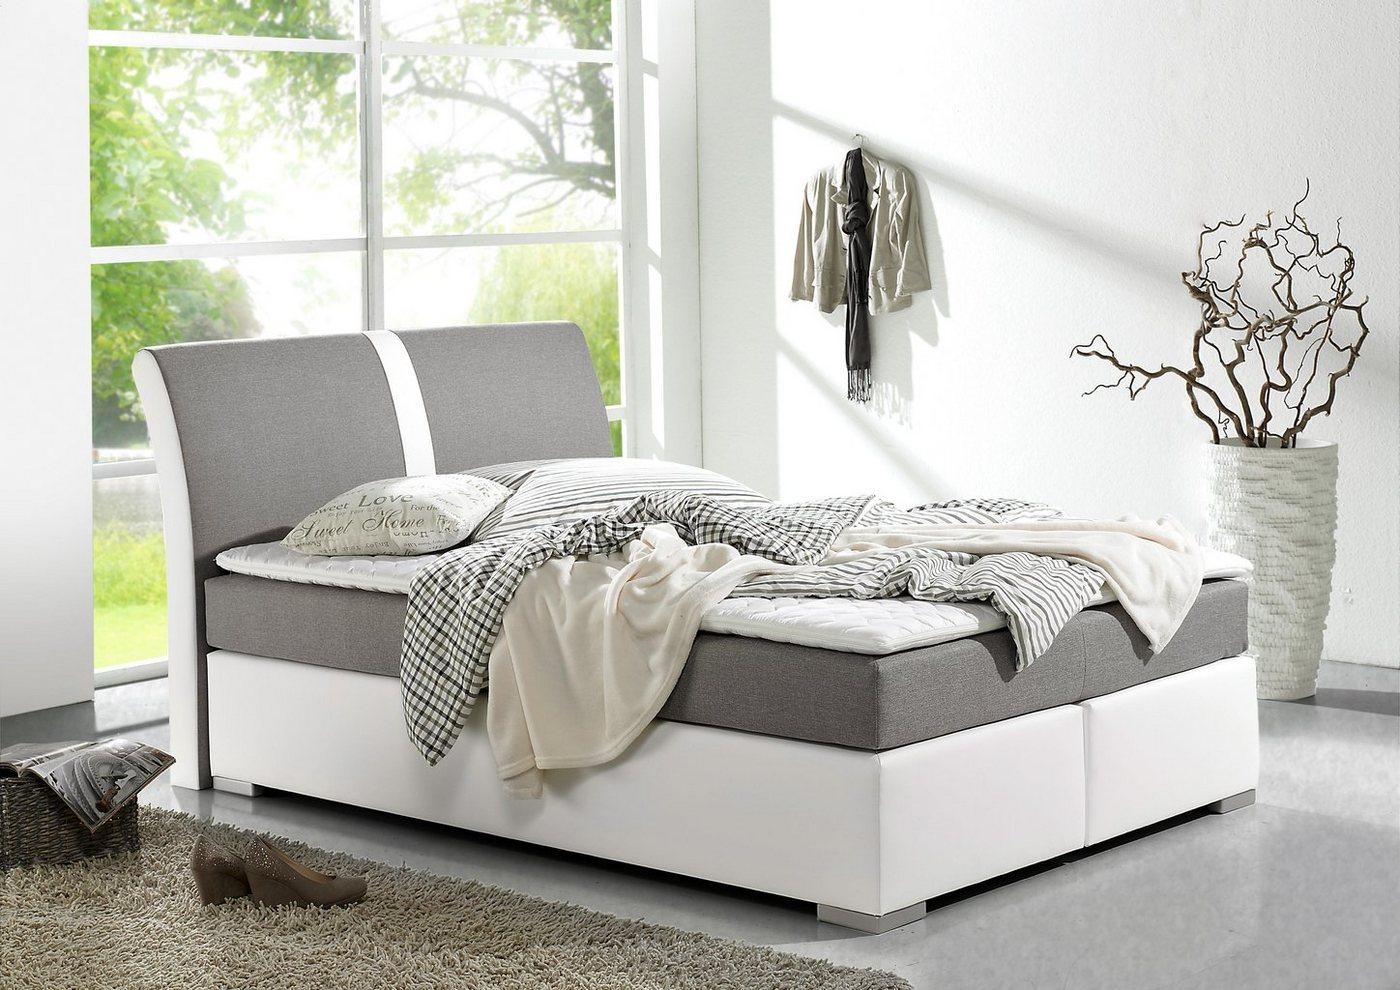 places of style boxspringbett inkl kaltschaum topper grau ohne aufbauservice bonnell. Black Bedroom Furniture Sets. Home Design Ideas